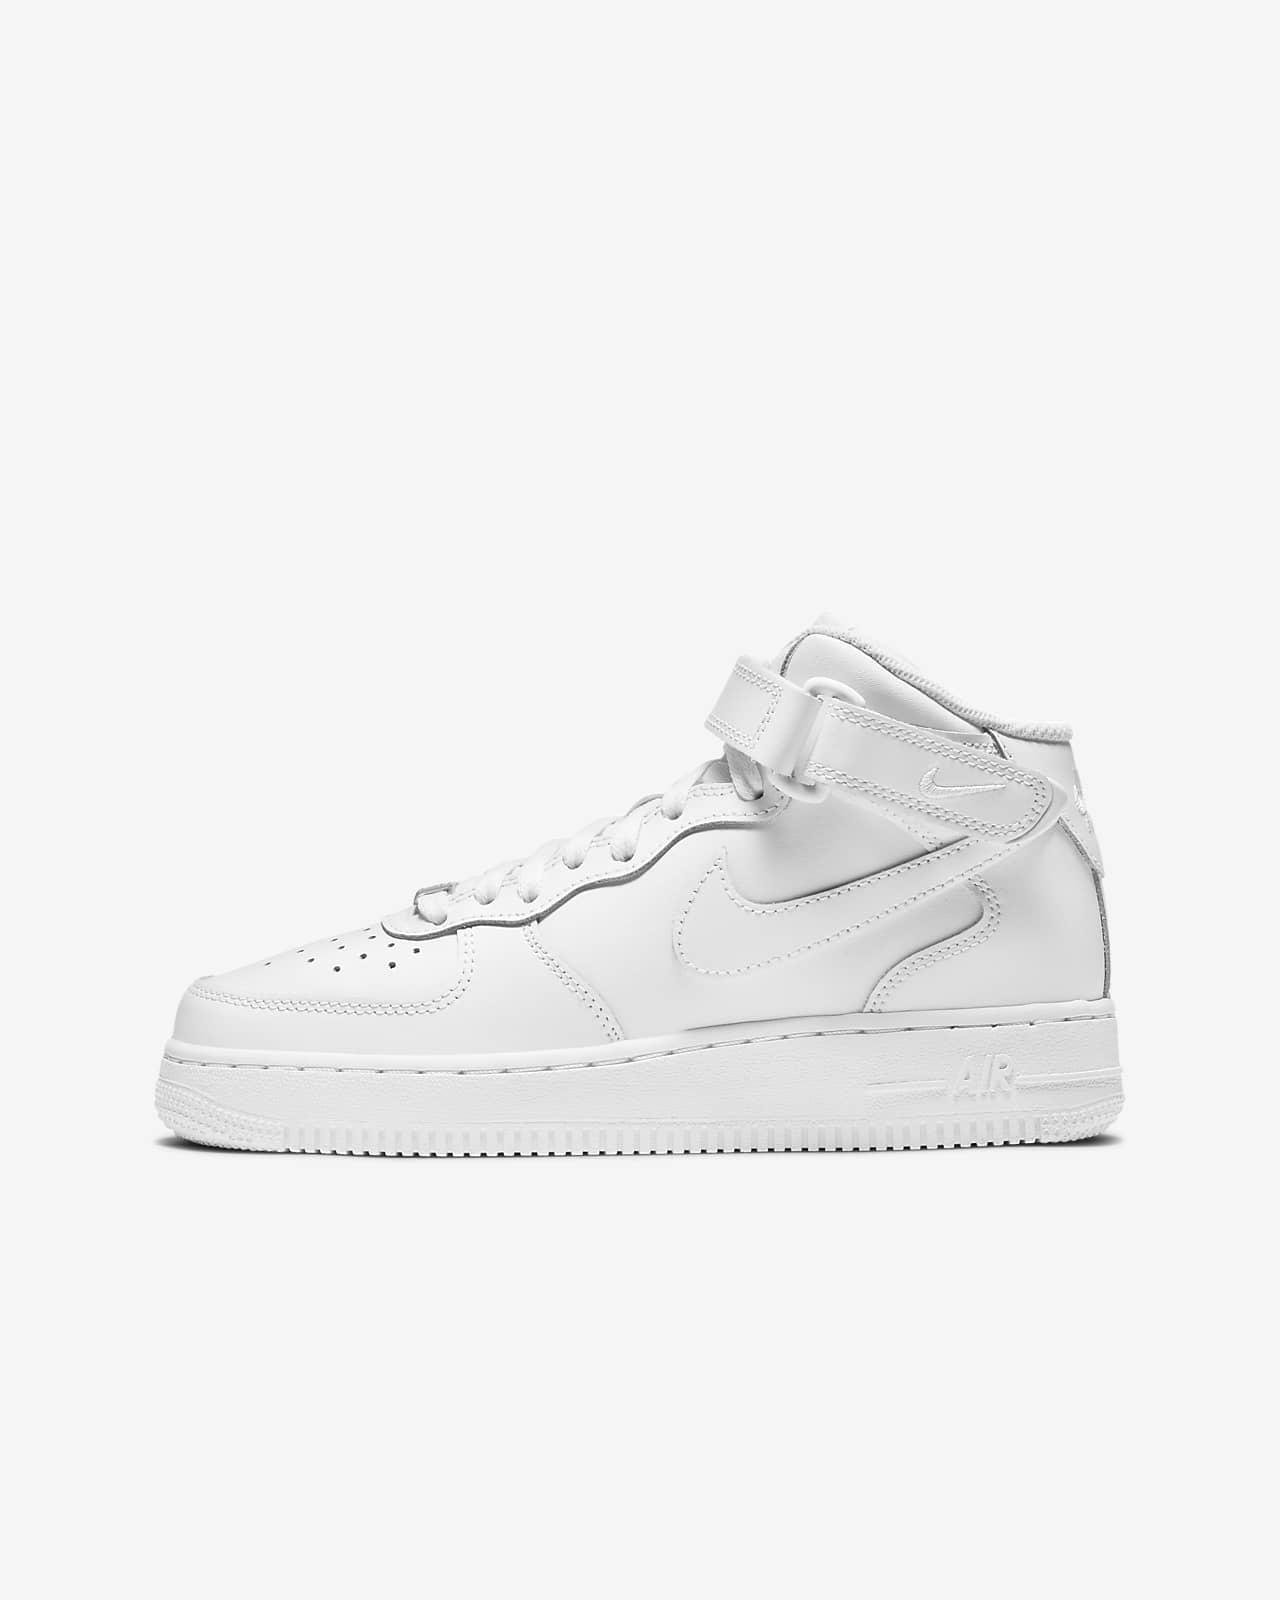 Кроссовки для школьников Nike Air Force 1 Mid LE